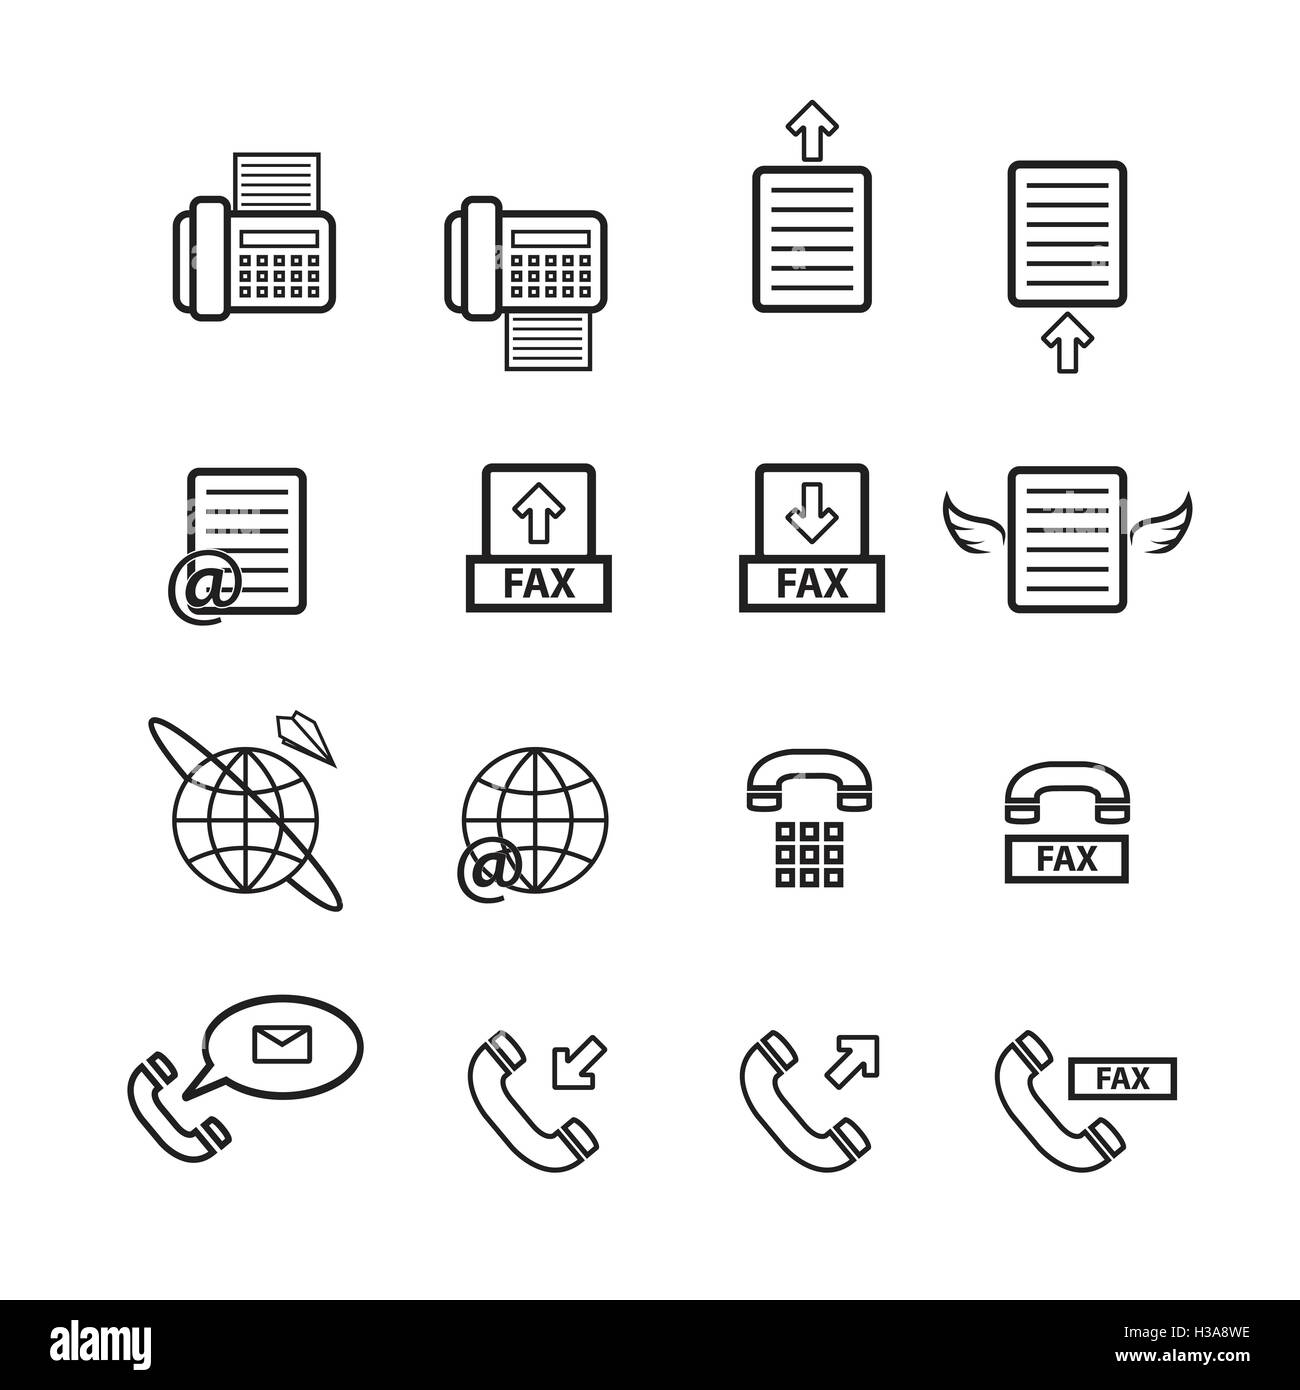 Fax vector, icon set - Stock Image